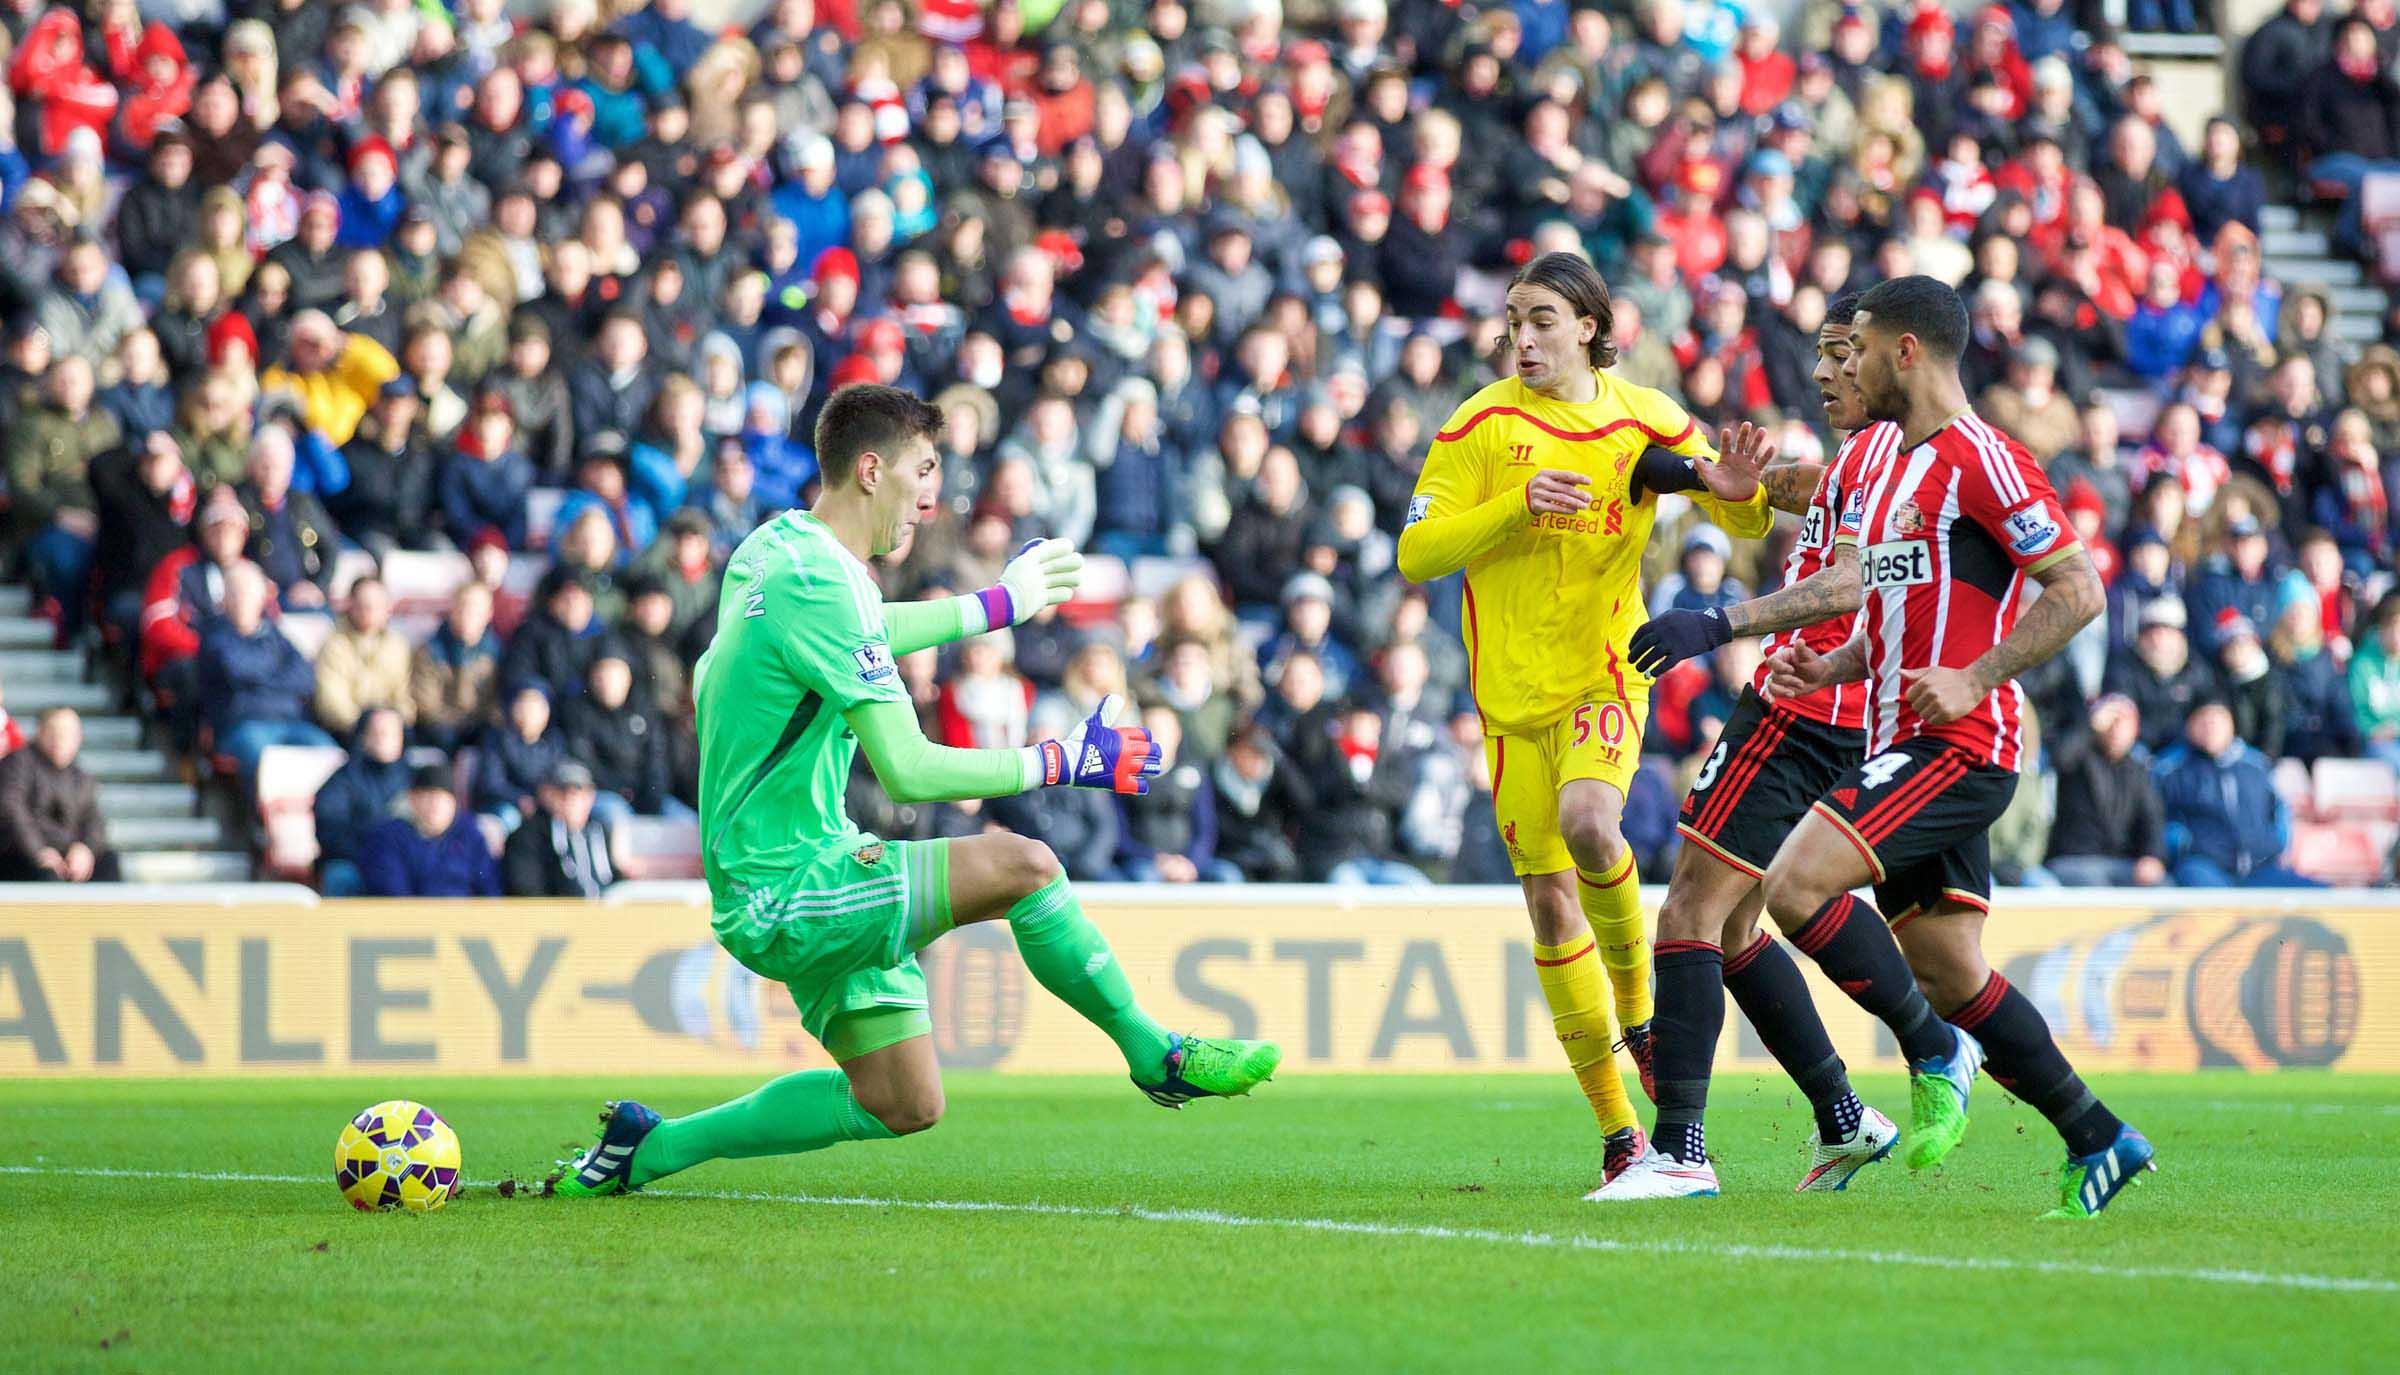 Football - FA Premier League - Sunderland AFC v Liverpool FC